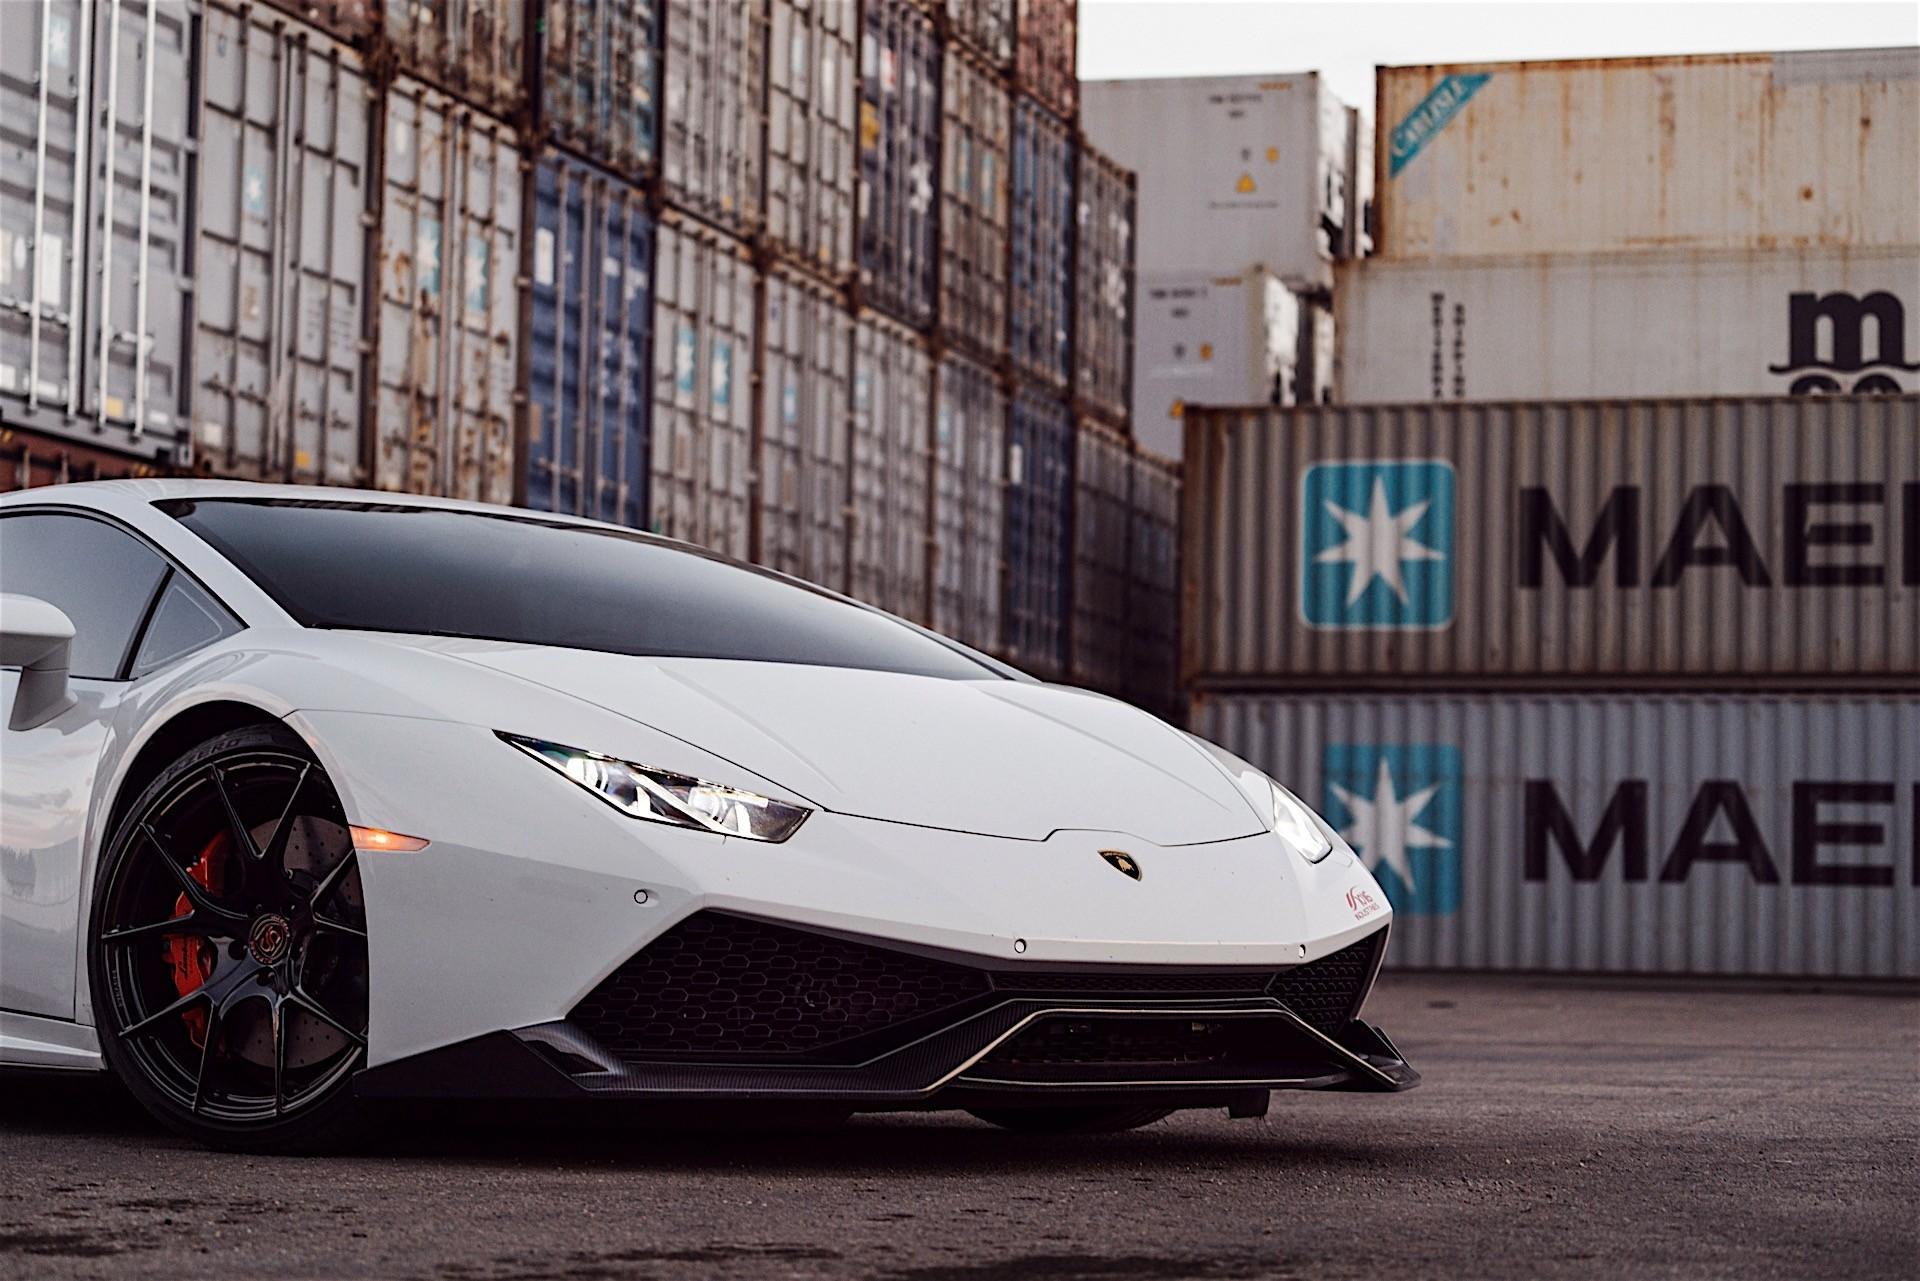 Lamborghini_Huracan_1016_Industries_12